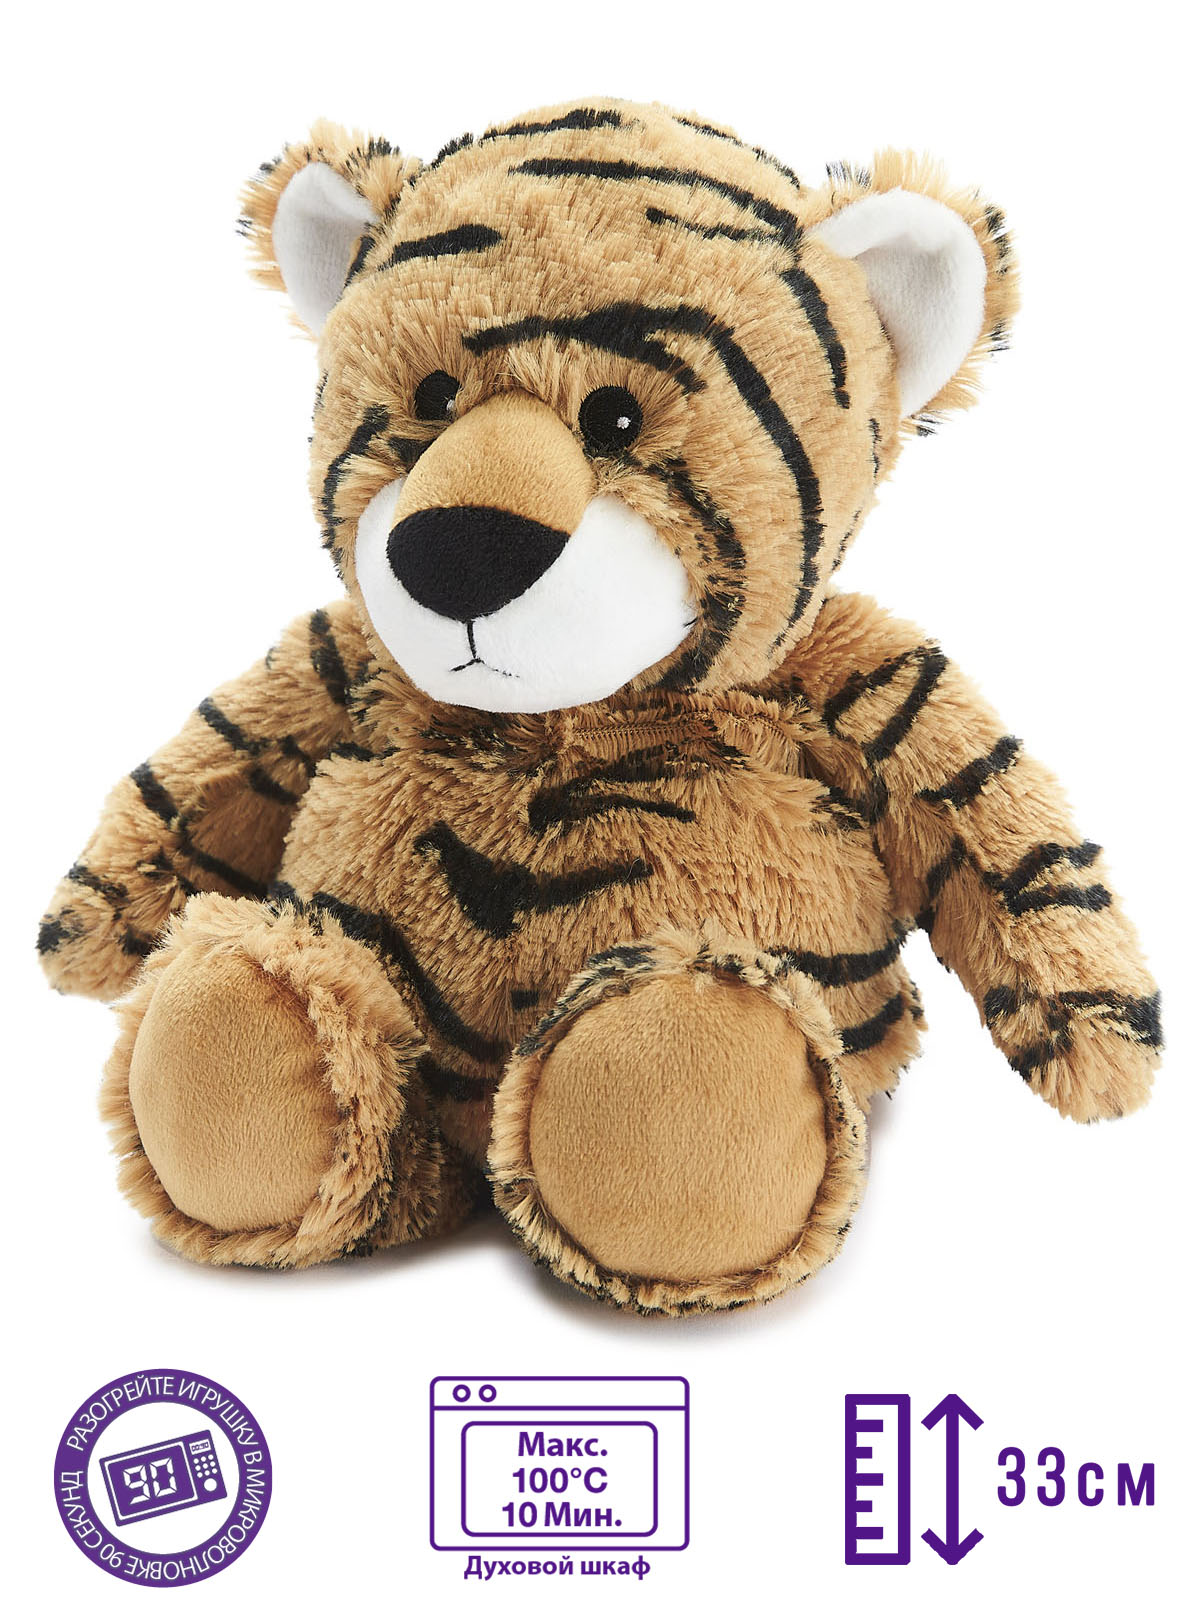 Пинкл (Pinkl) | Игрушка-грелка Тигр  | Intelex Warmies Cozy Plush Tiger